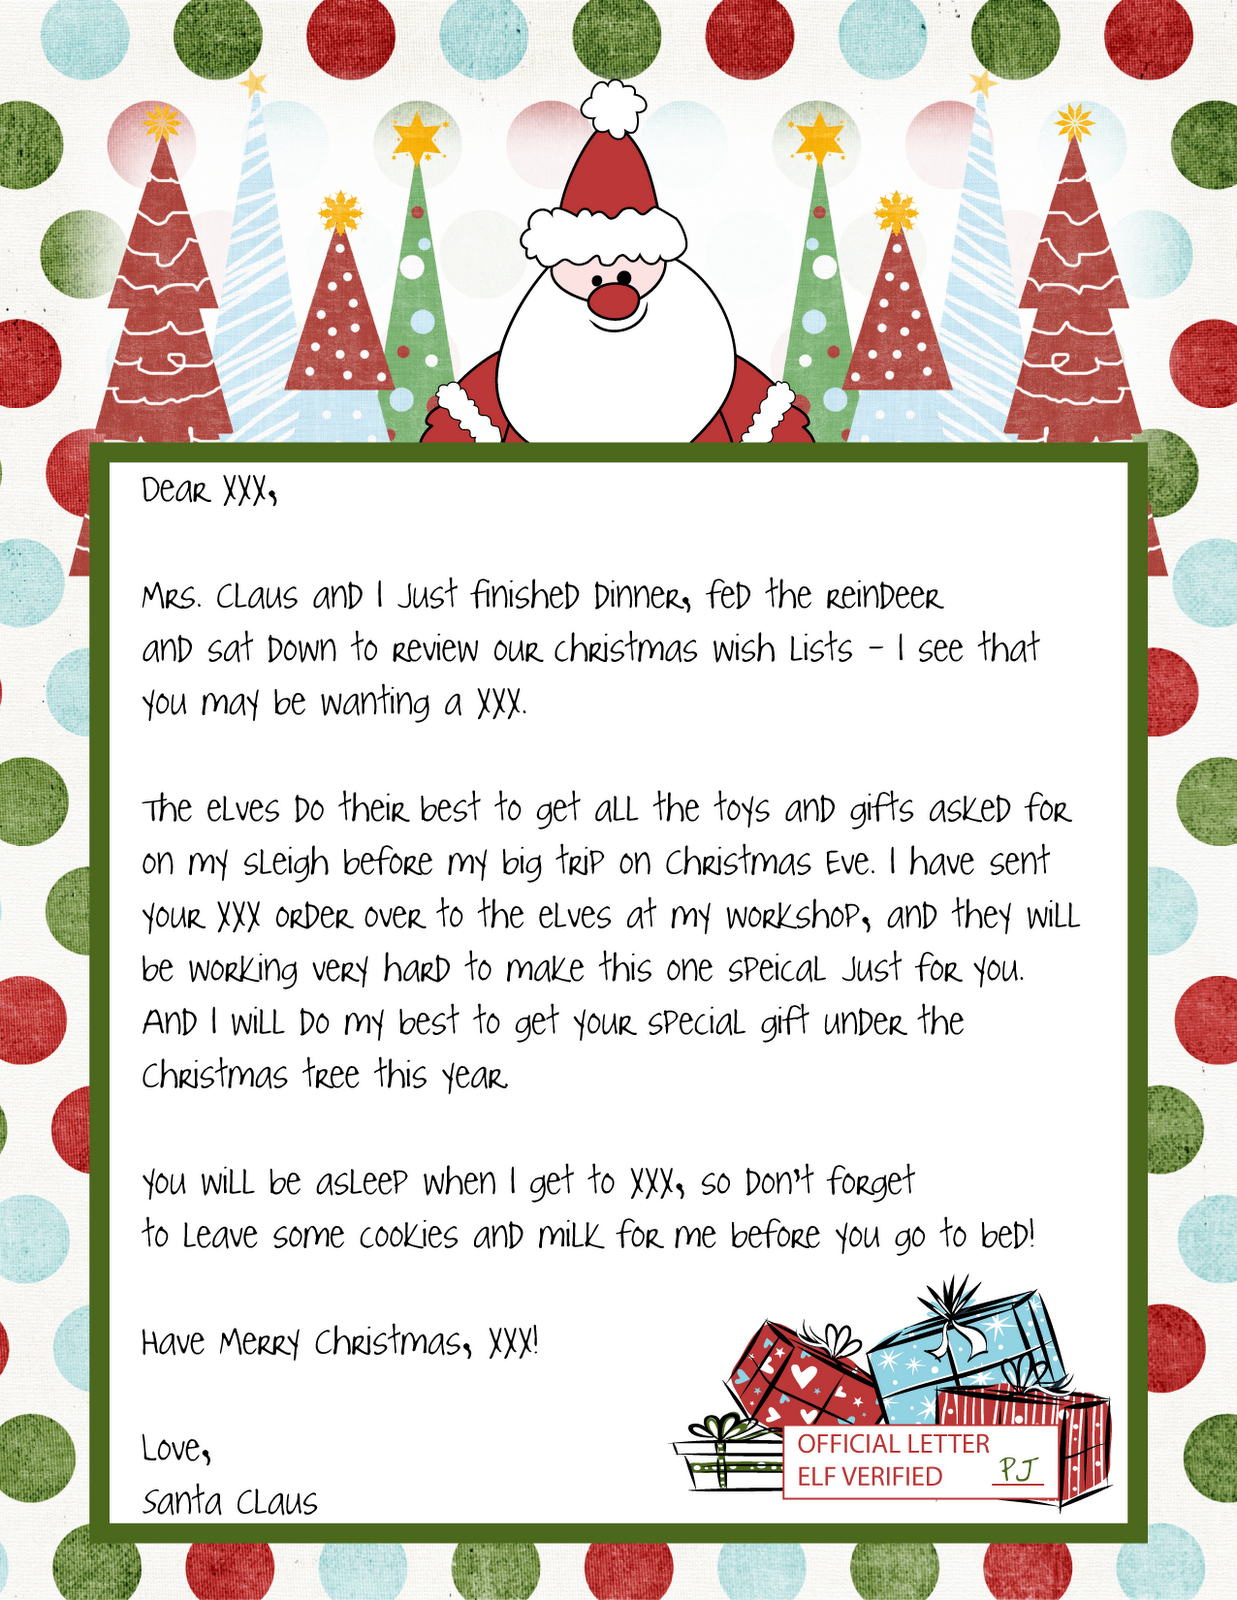 Printable Blank Santa Claus - Free Large Images … | Weddings | Chris… - Free Printable Letters From Santa Claus